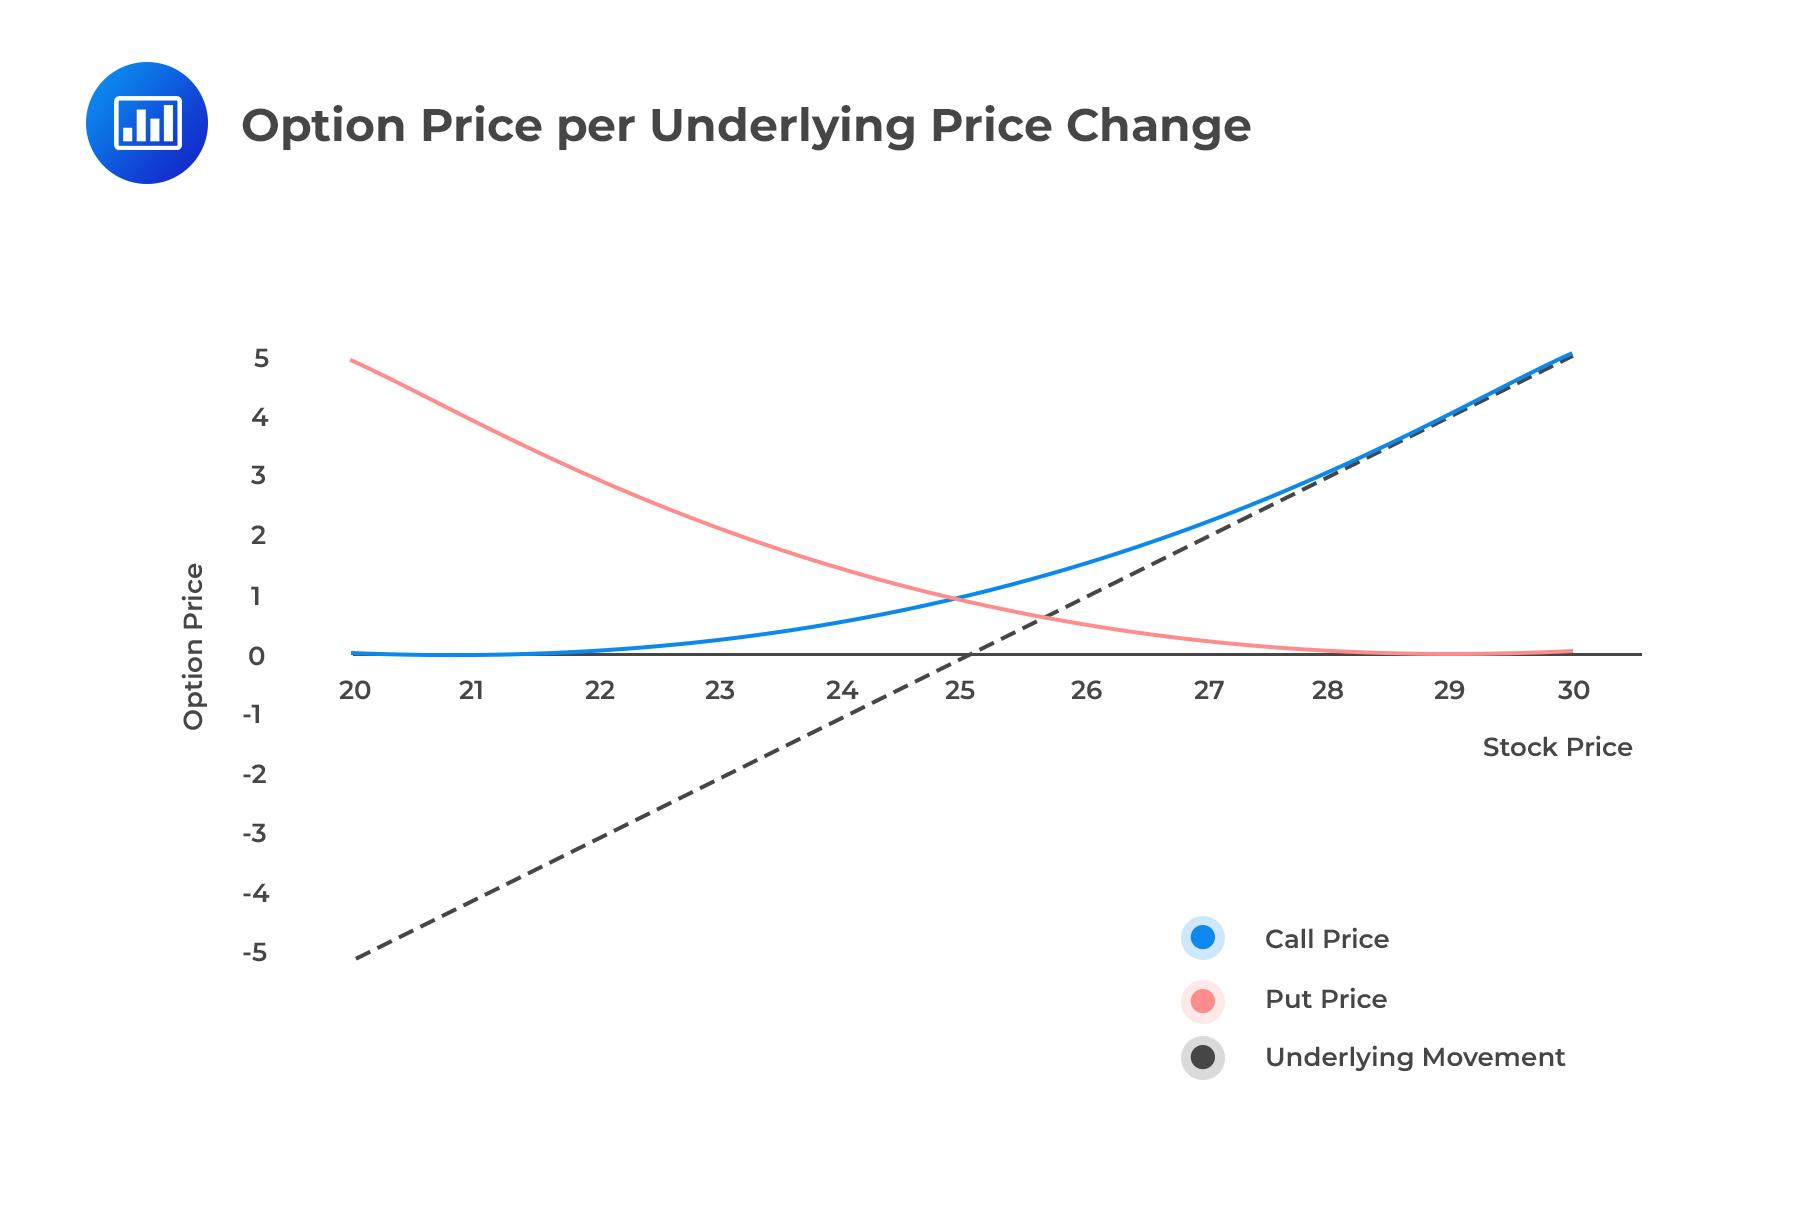 Option Price per Underlying Price Change